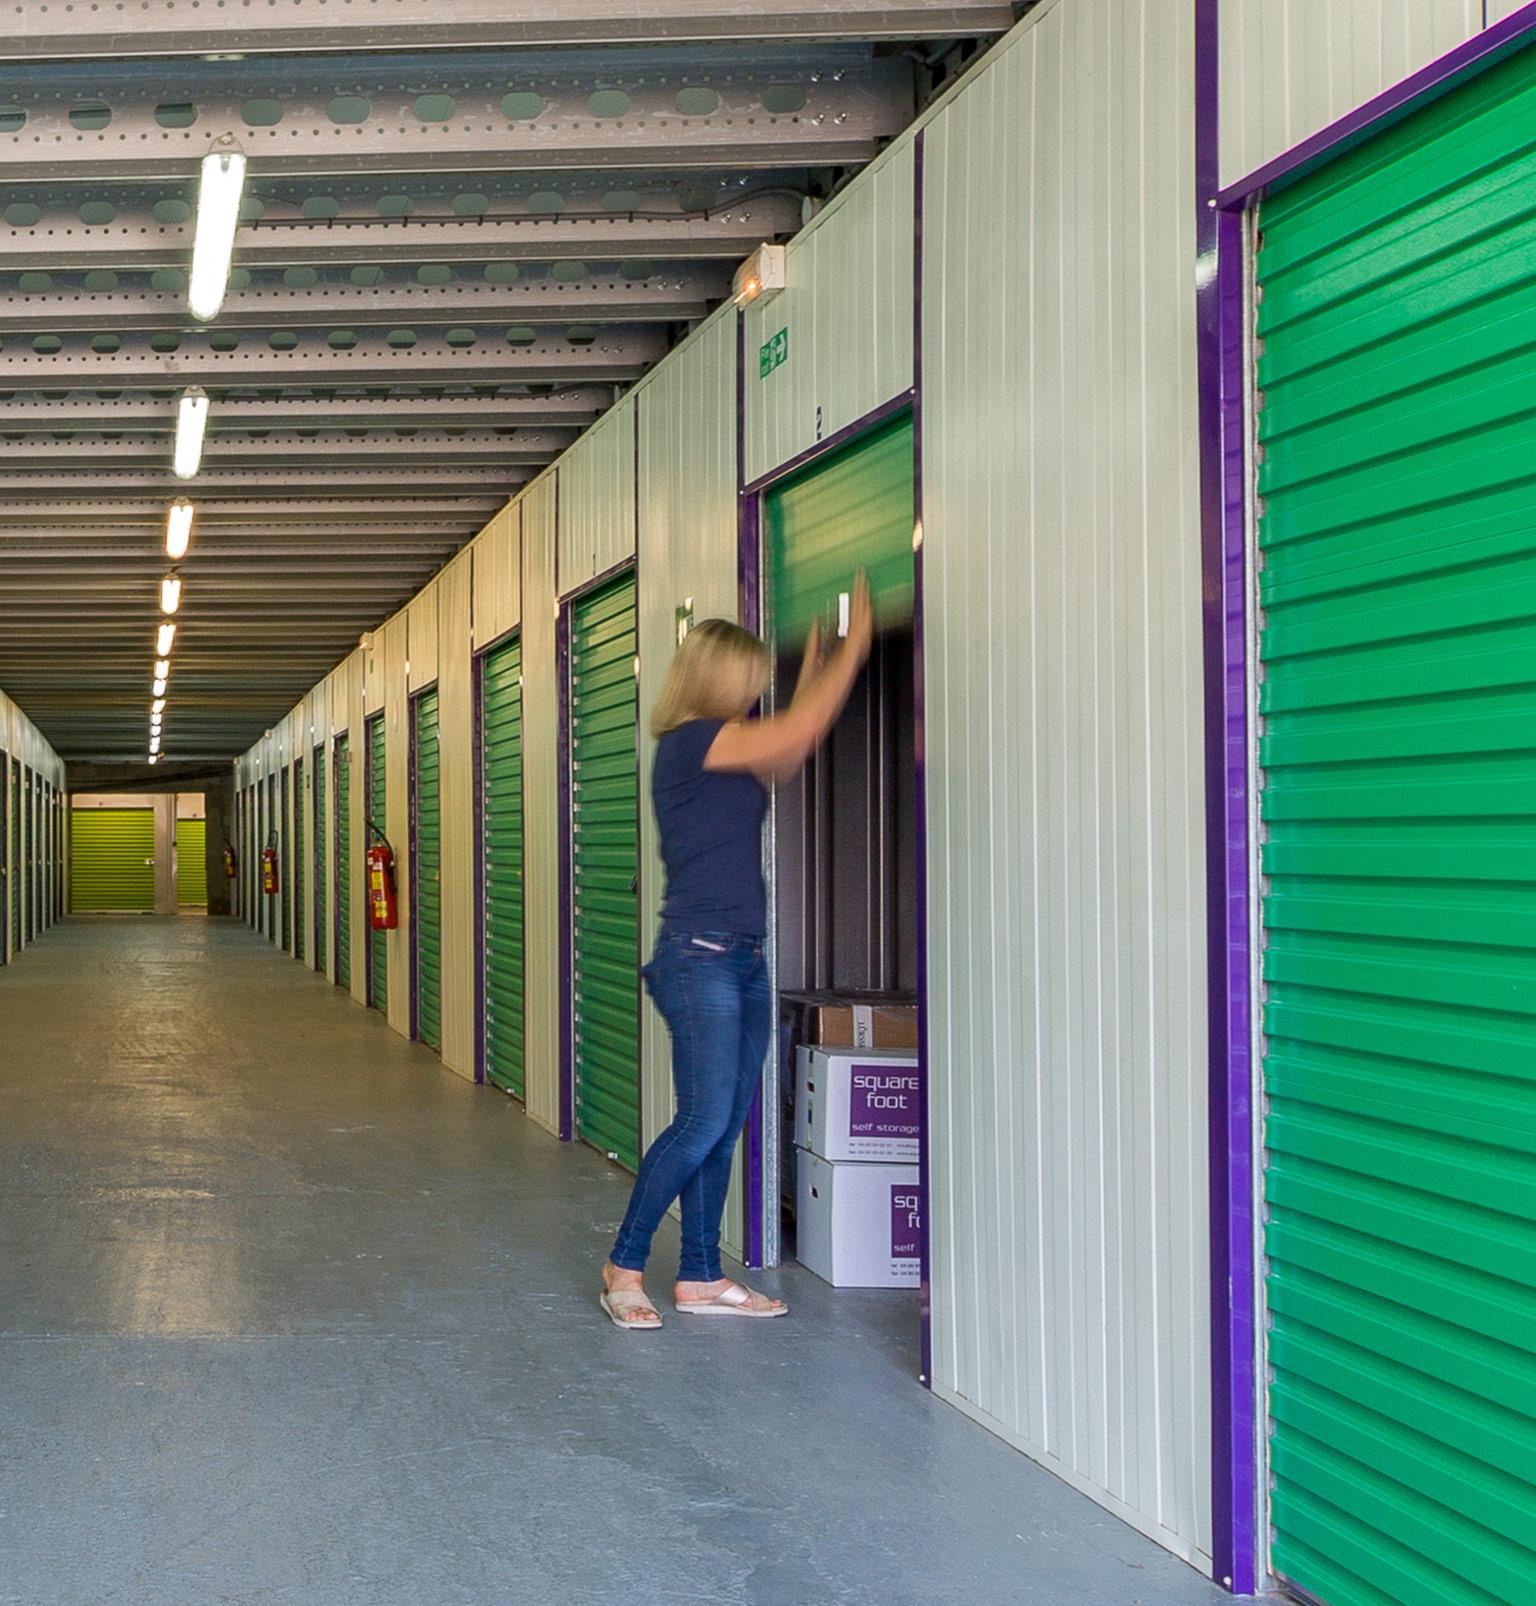 Furniture storage and box rental in Biot, Cannes, Antibes, Valbonne -